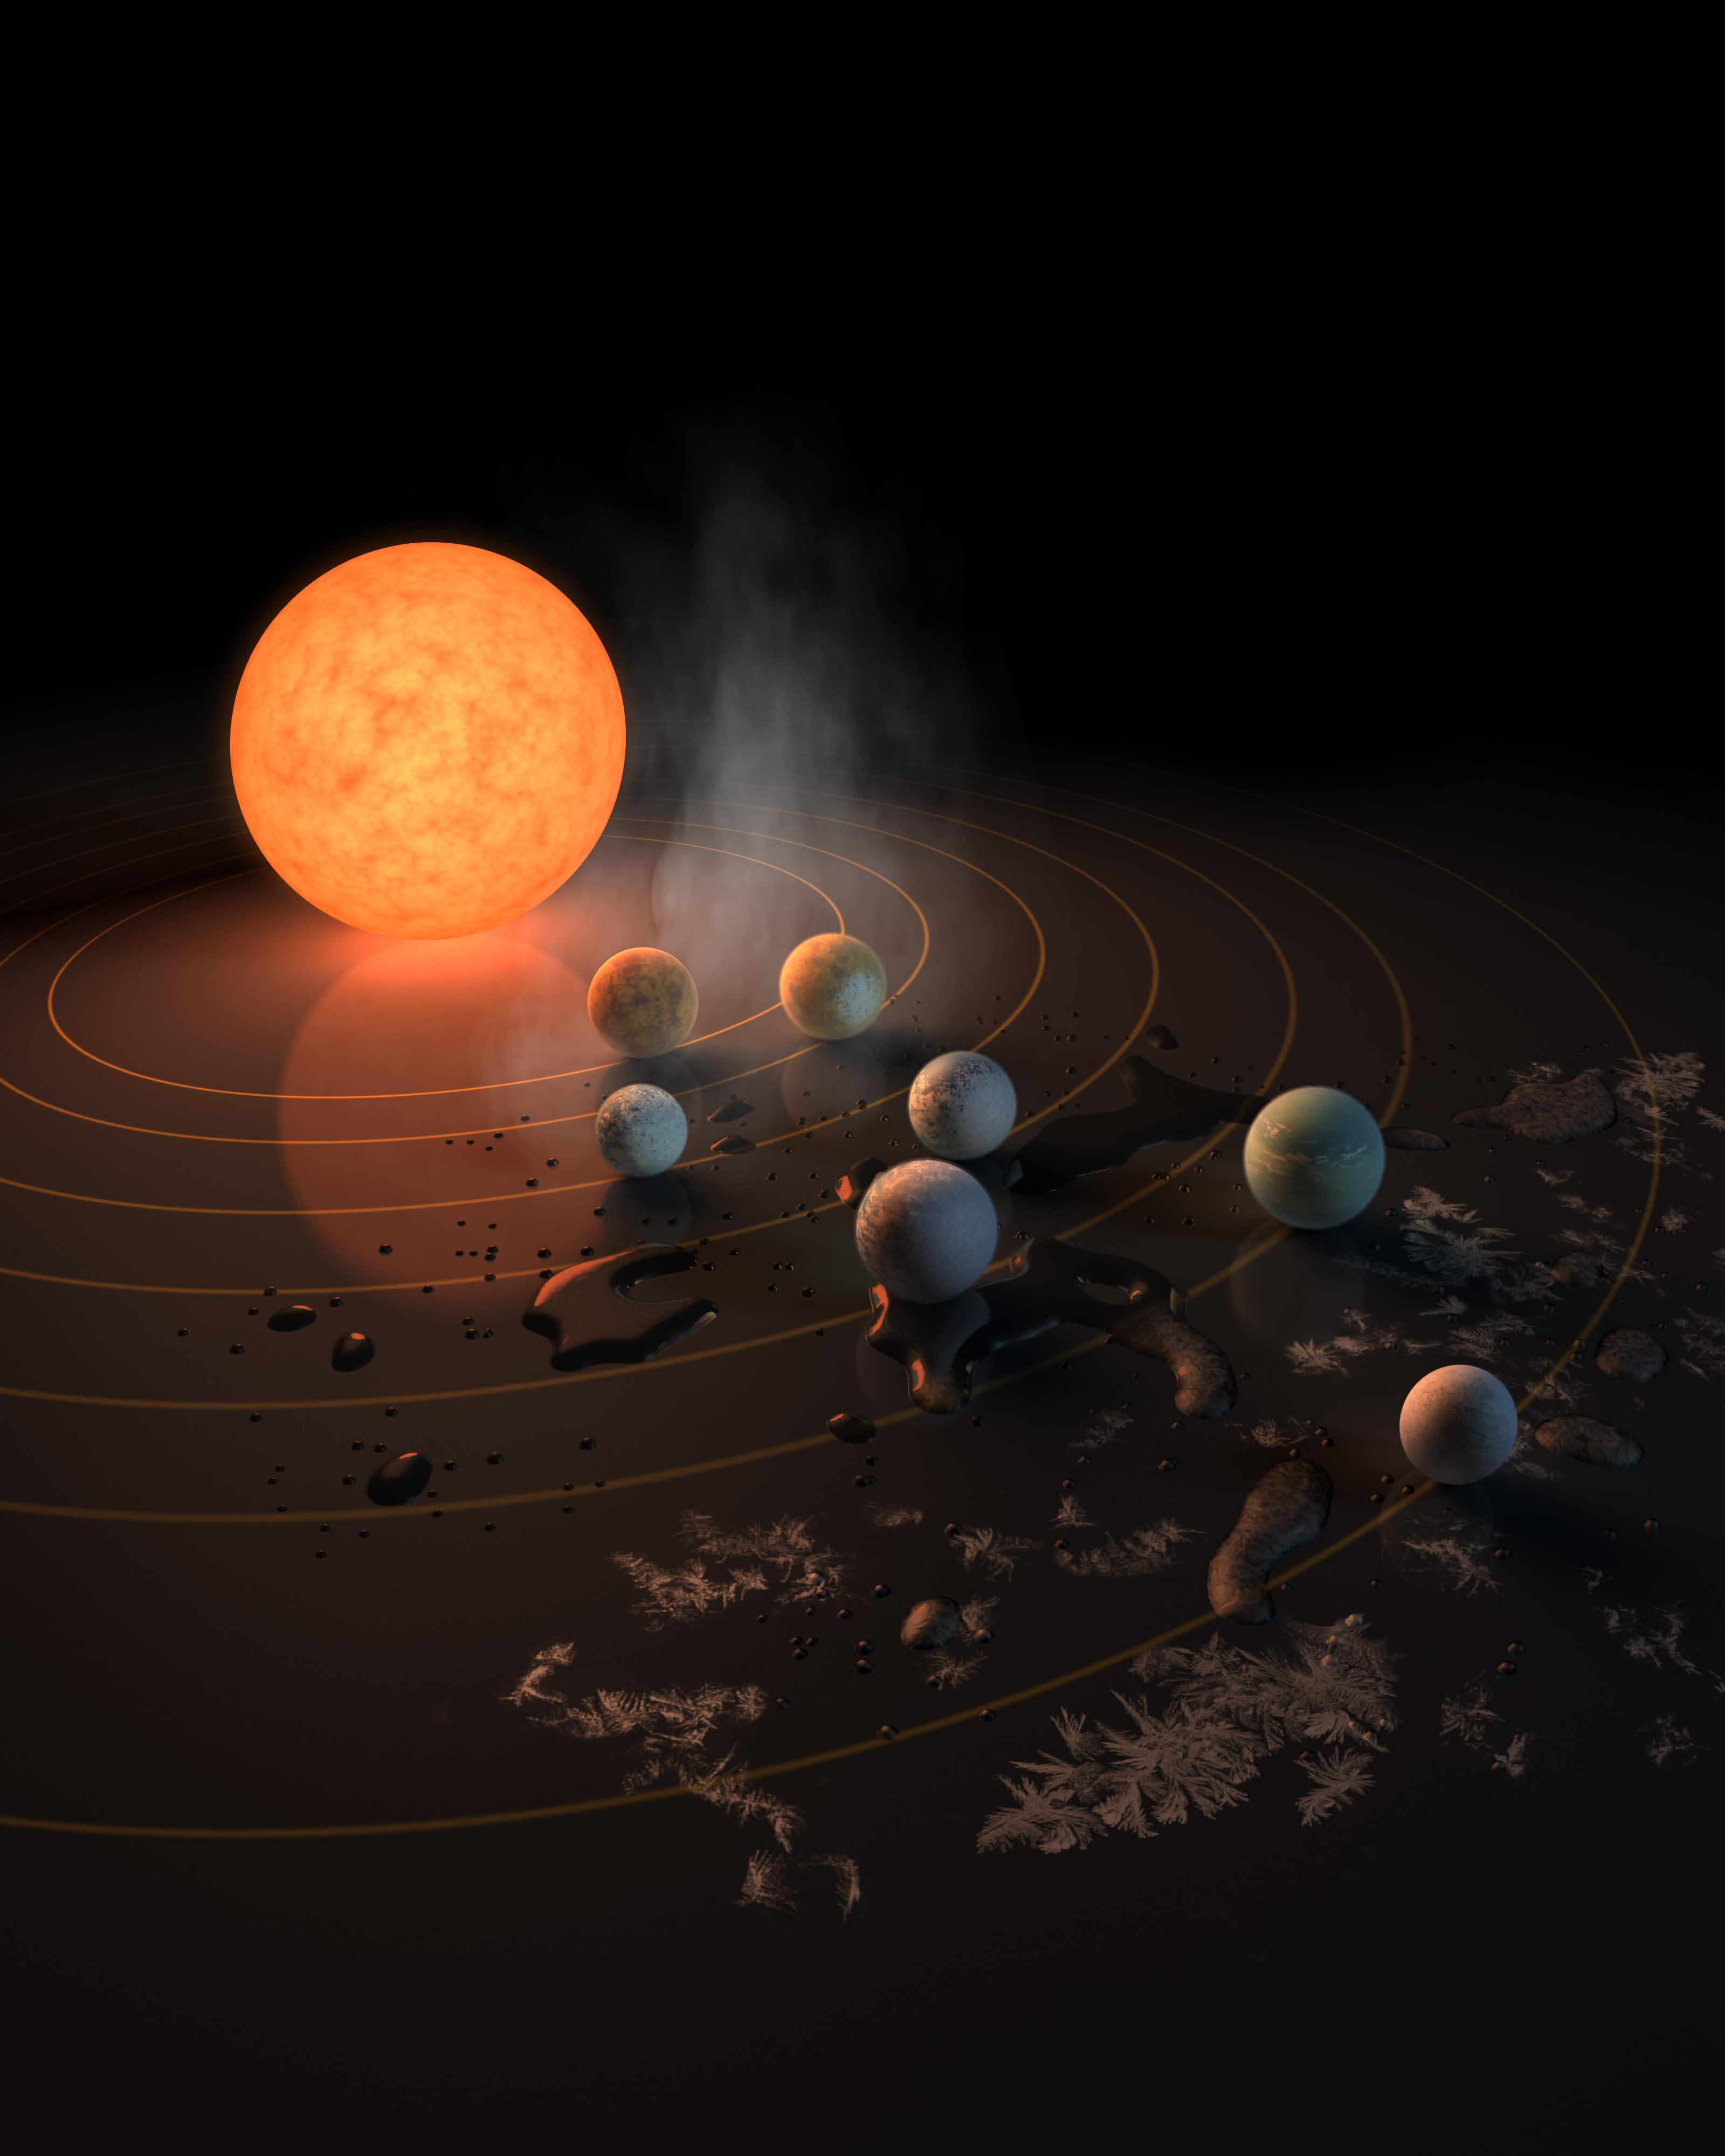 nasa planetary scientists - HD840×1050